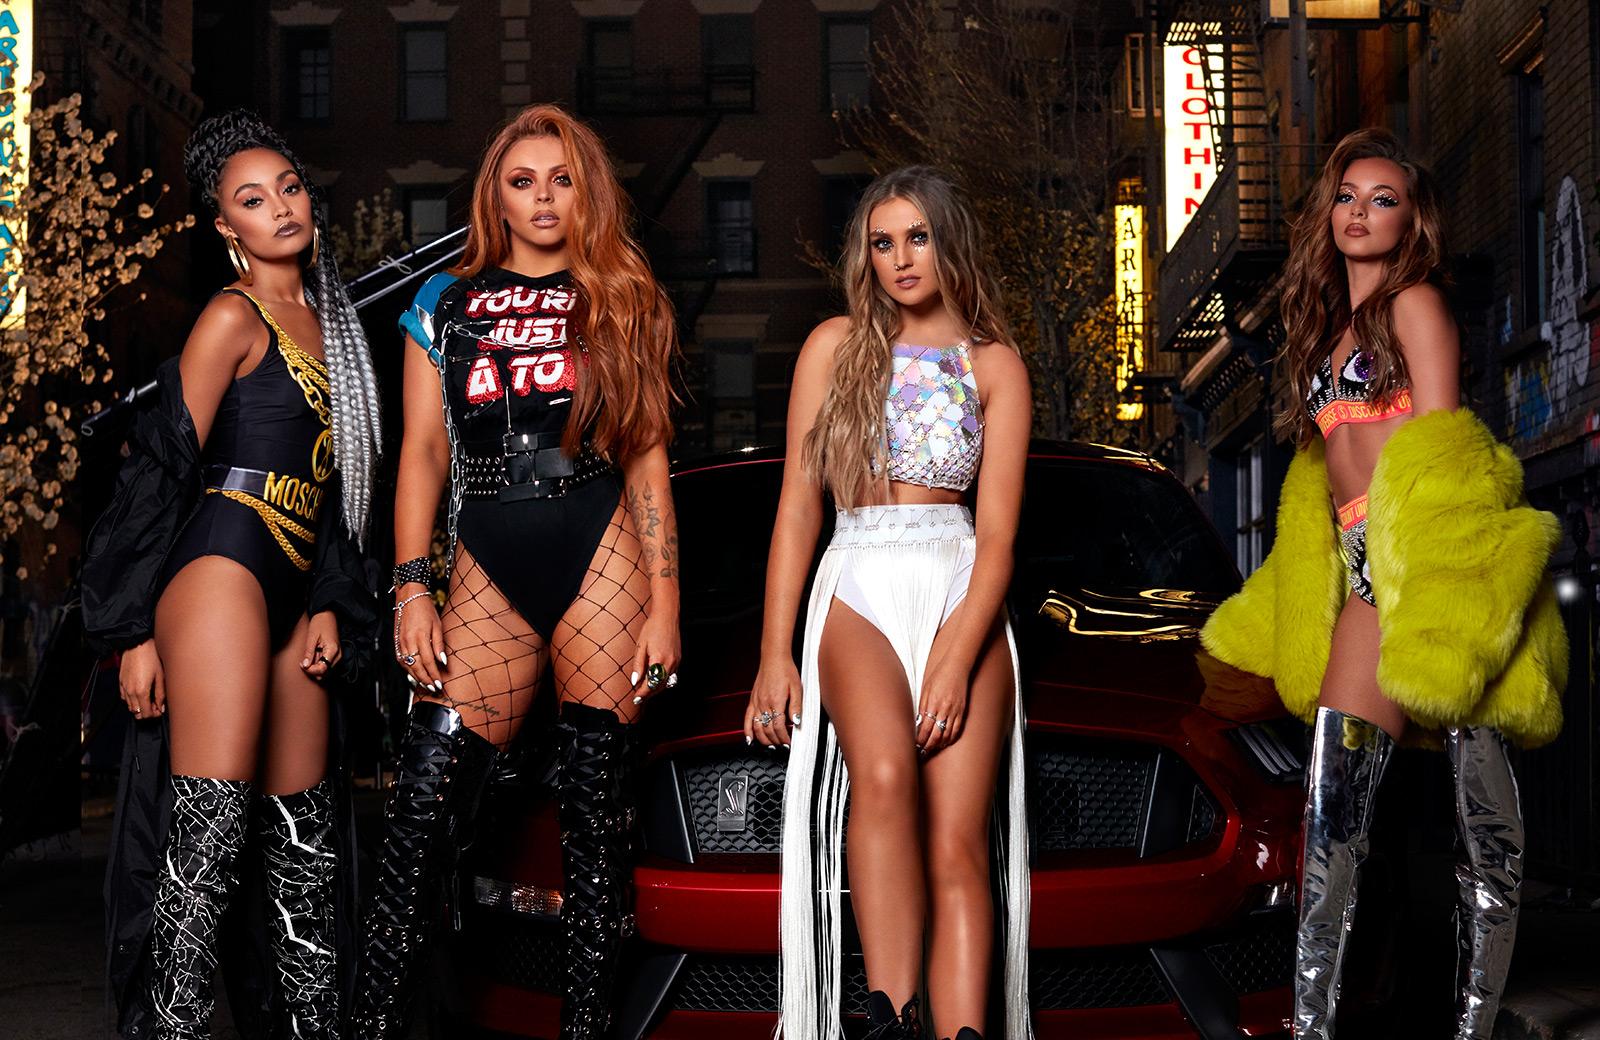 Little Mix é um girl group pop britânico consistente pelas seguintes integrantes Jade Thirlwall LeighAnne Pinnock Jesy Nelson e Perrie Edwards